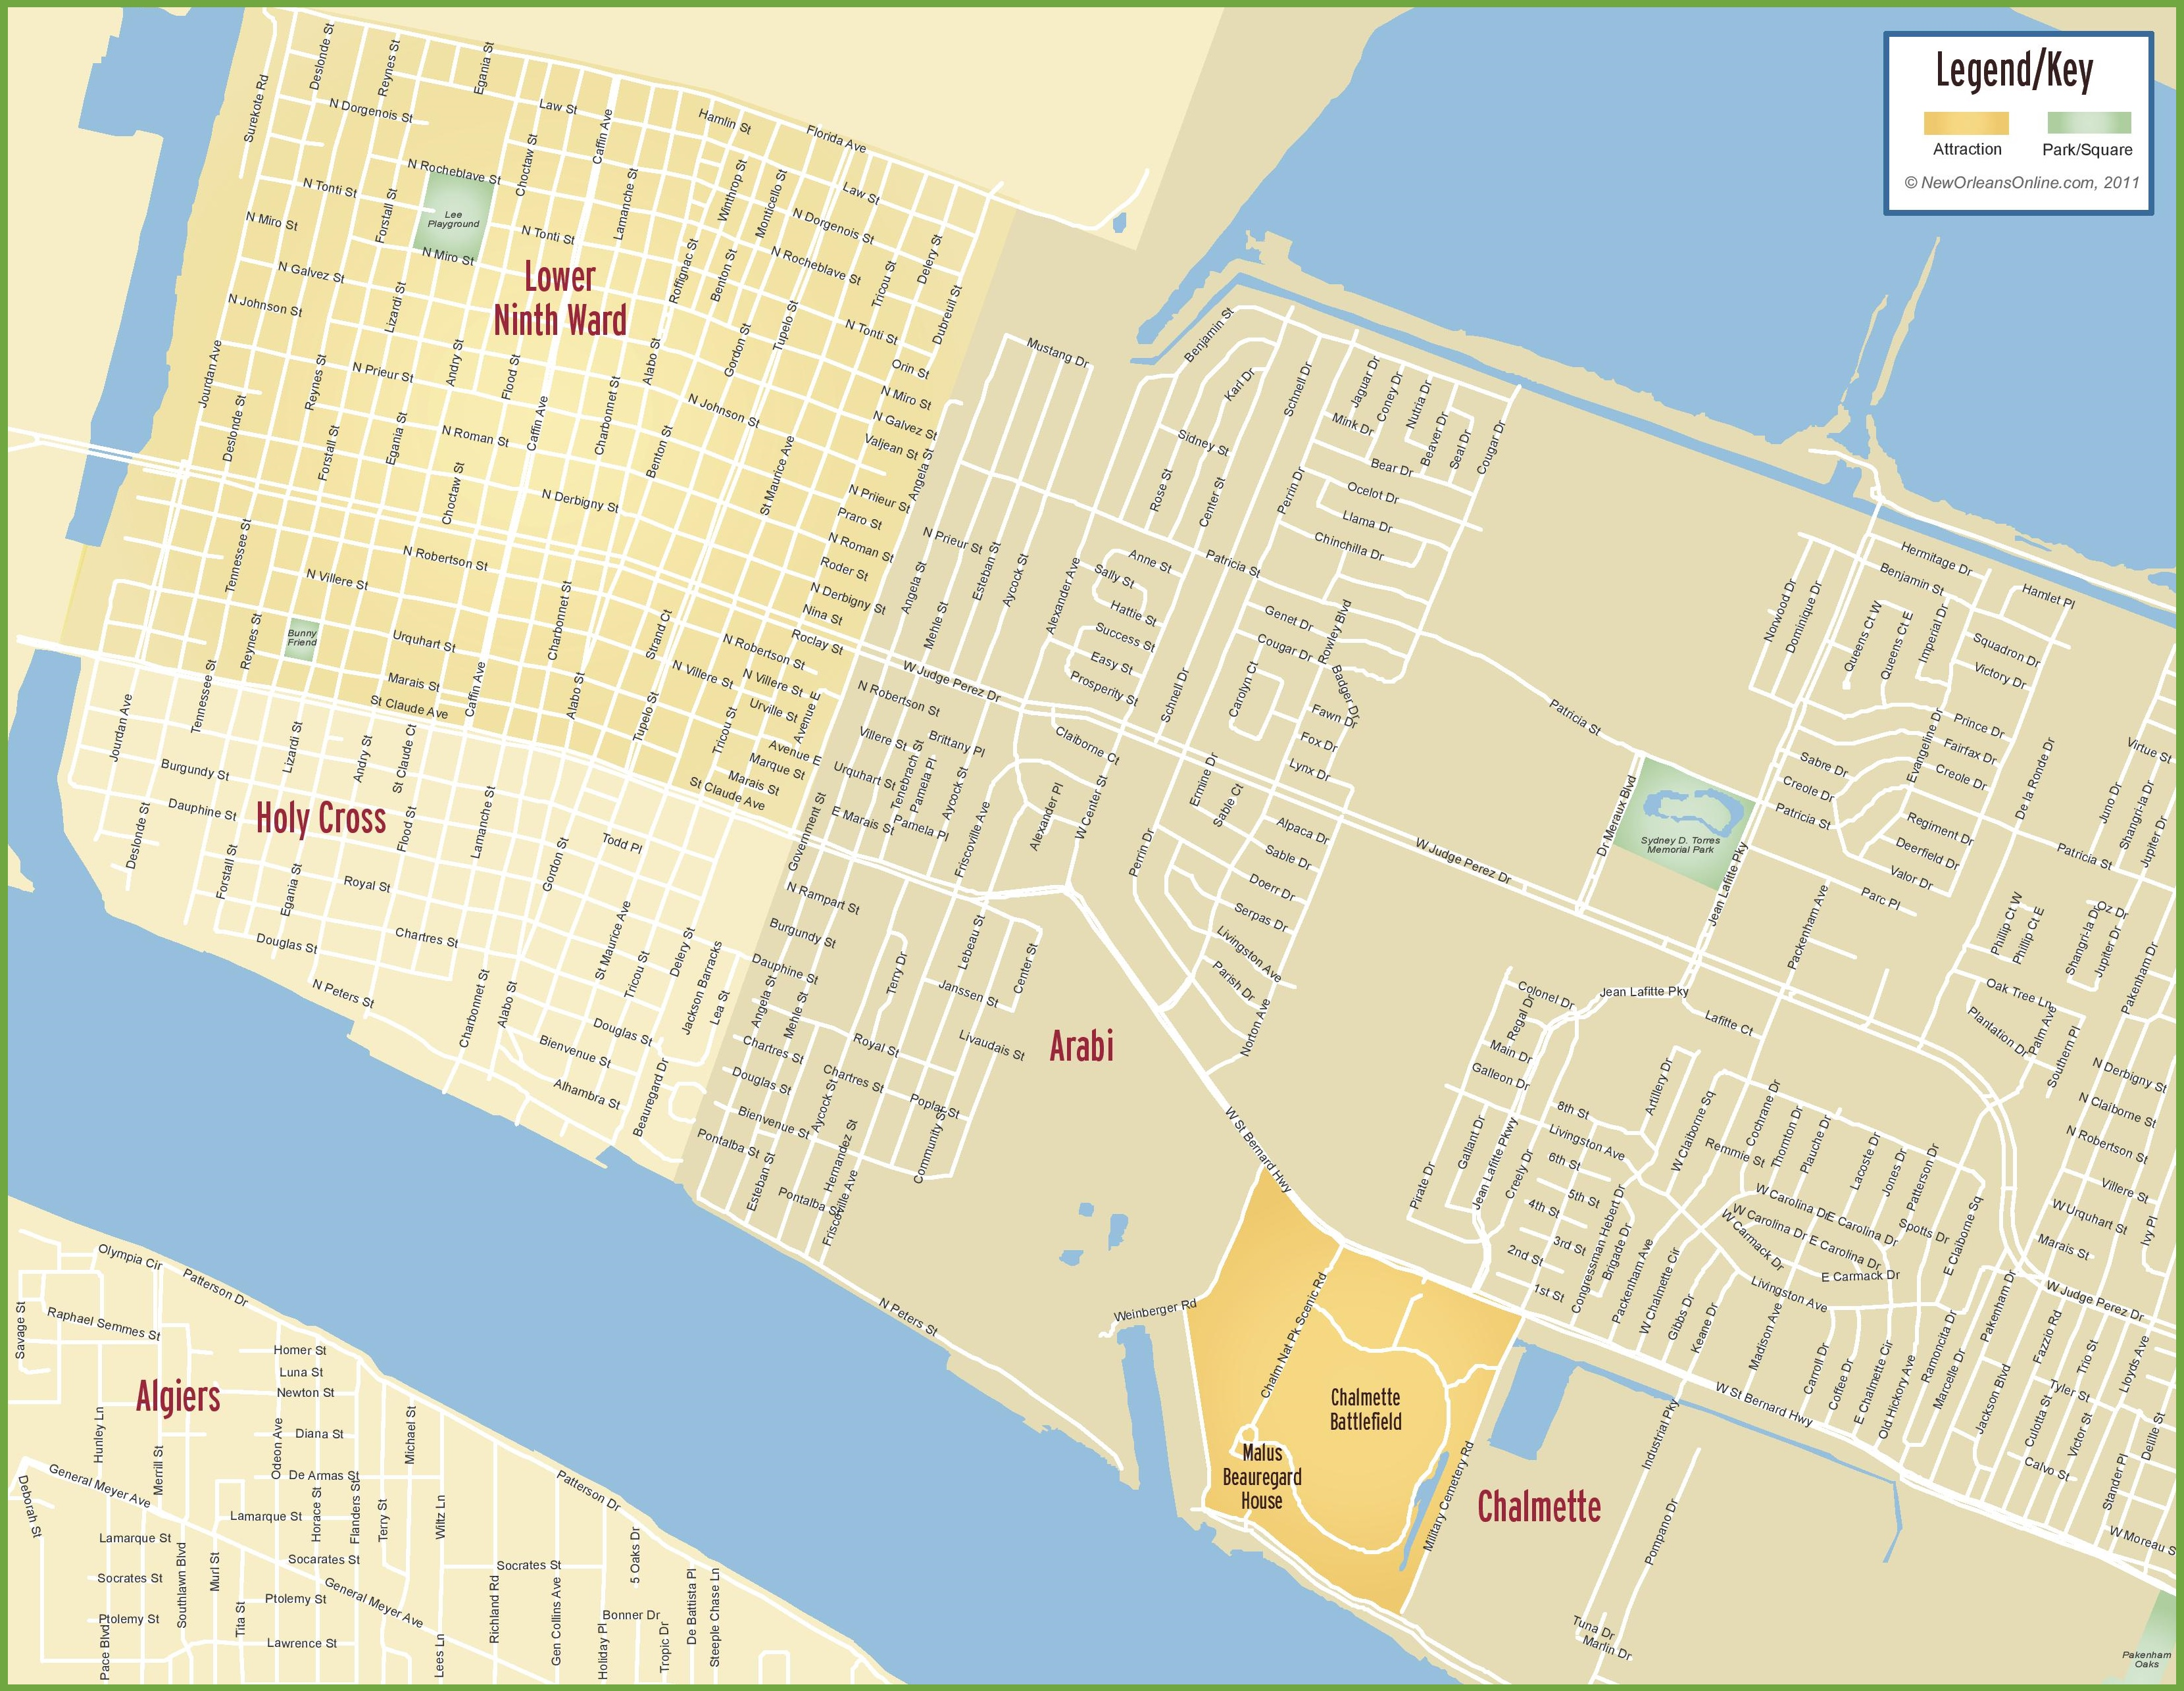 9Th Ward New Orleans Map New Orleans Ninth Ward map 9Th Ward New Orleans Map